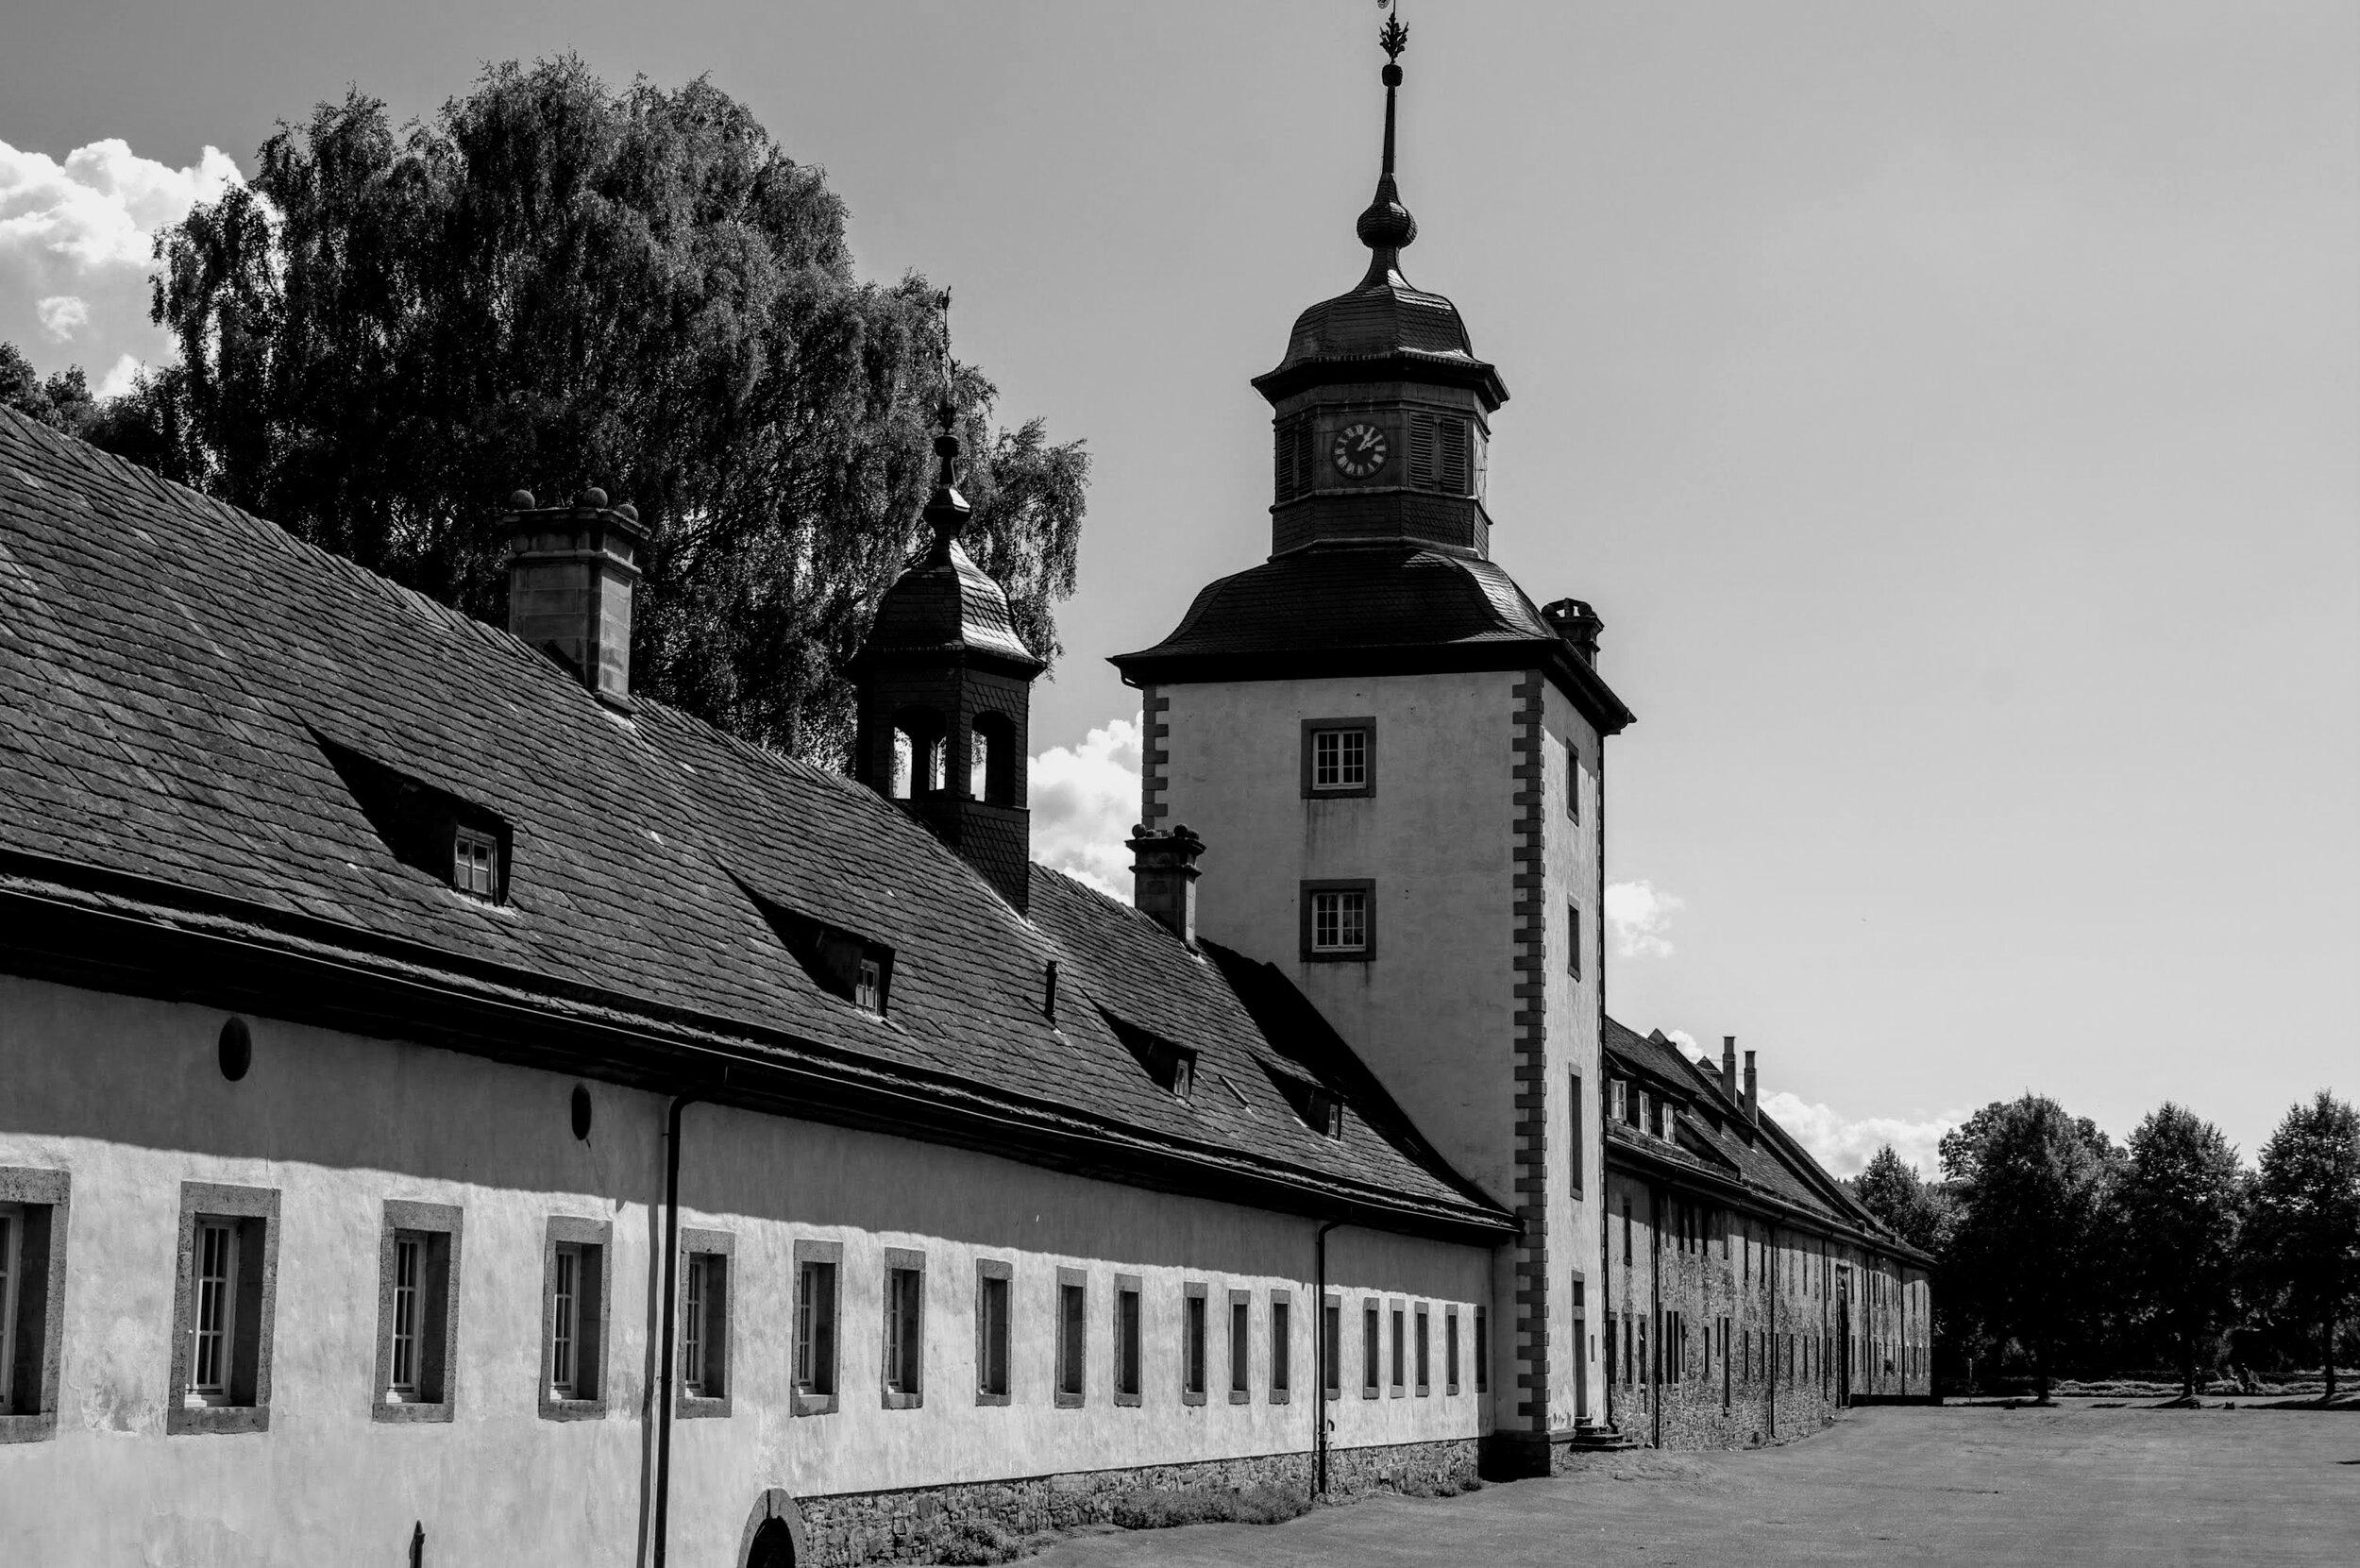 Monastery/Castle near Hoexter